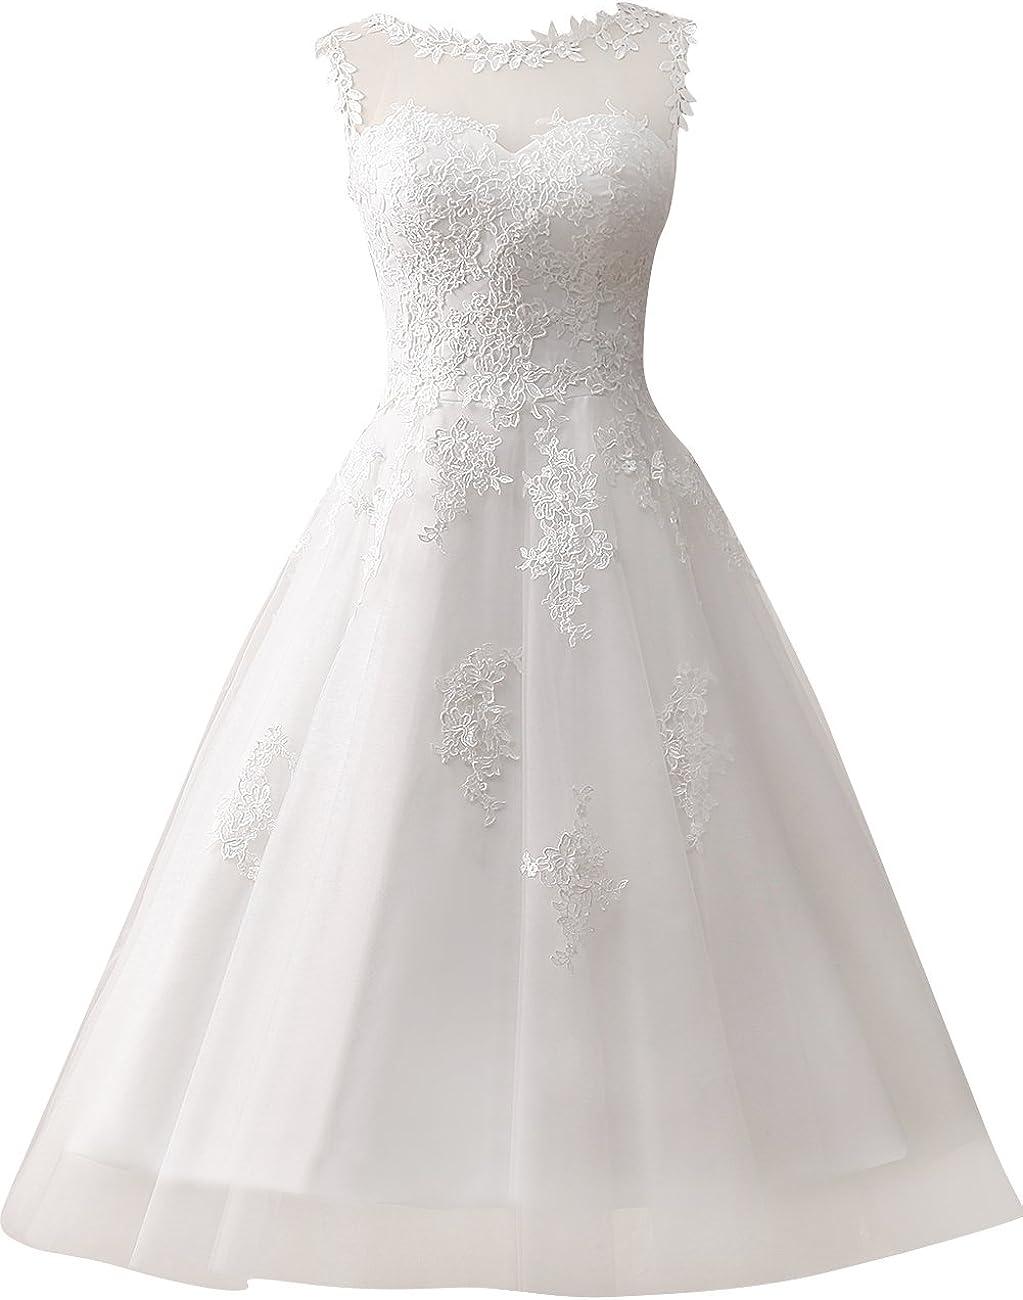 Wedding Dress Lace Bride Dress Short Vintage Wedding Gown Tulle Bridal Gowns Appliques